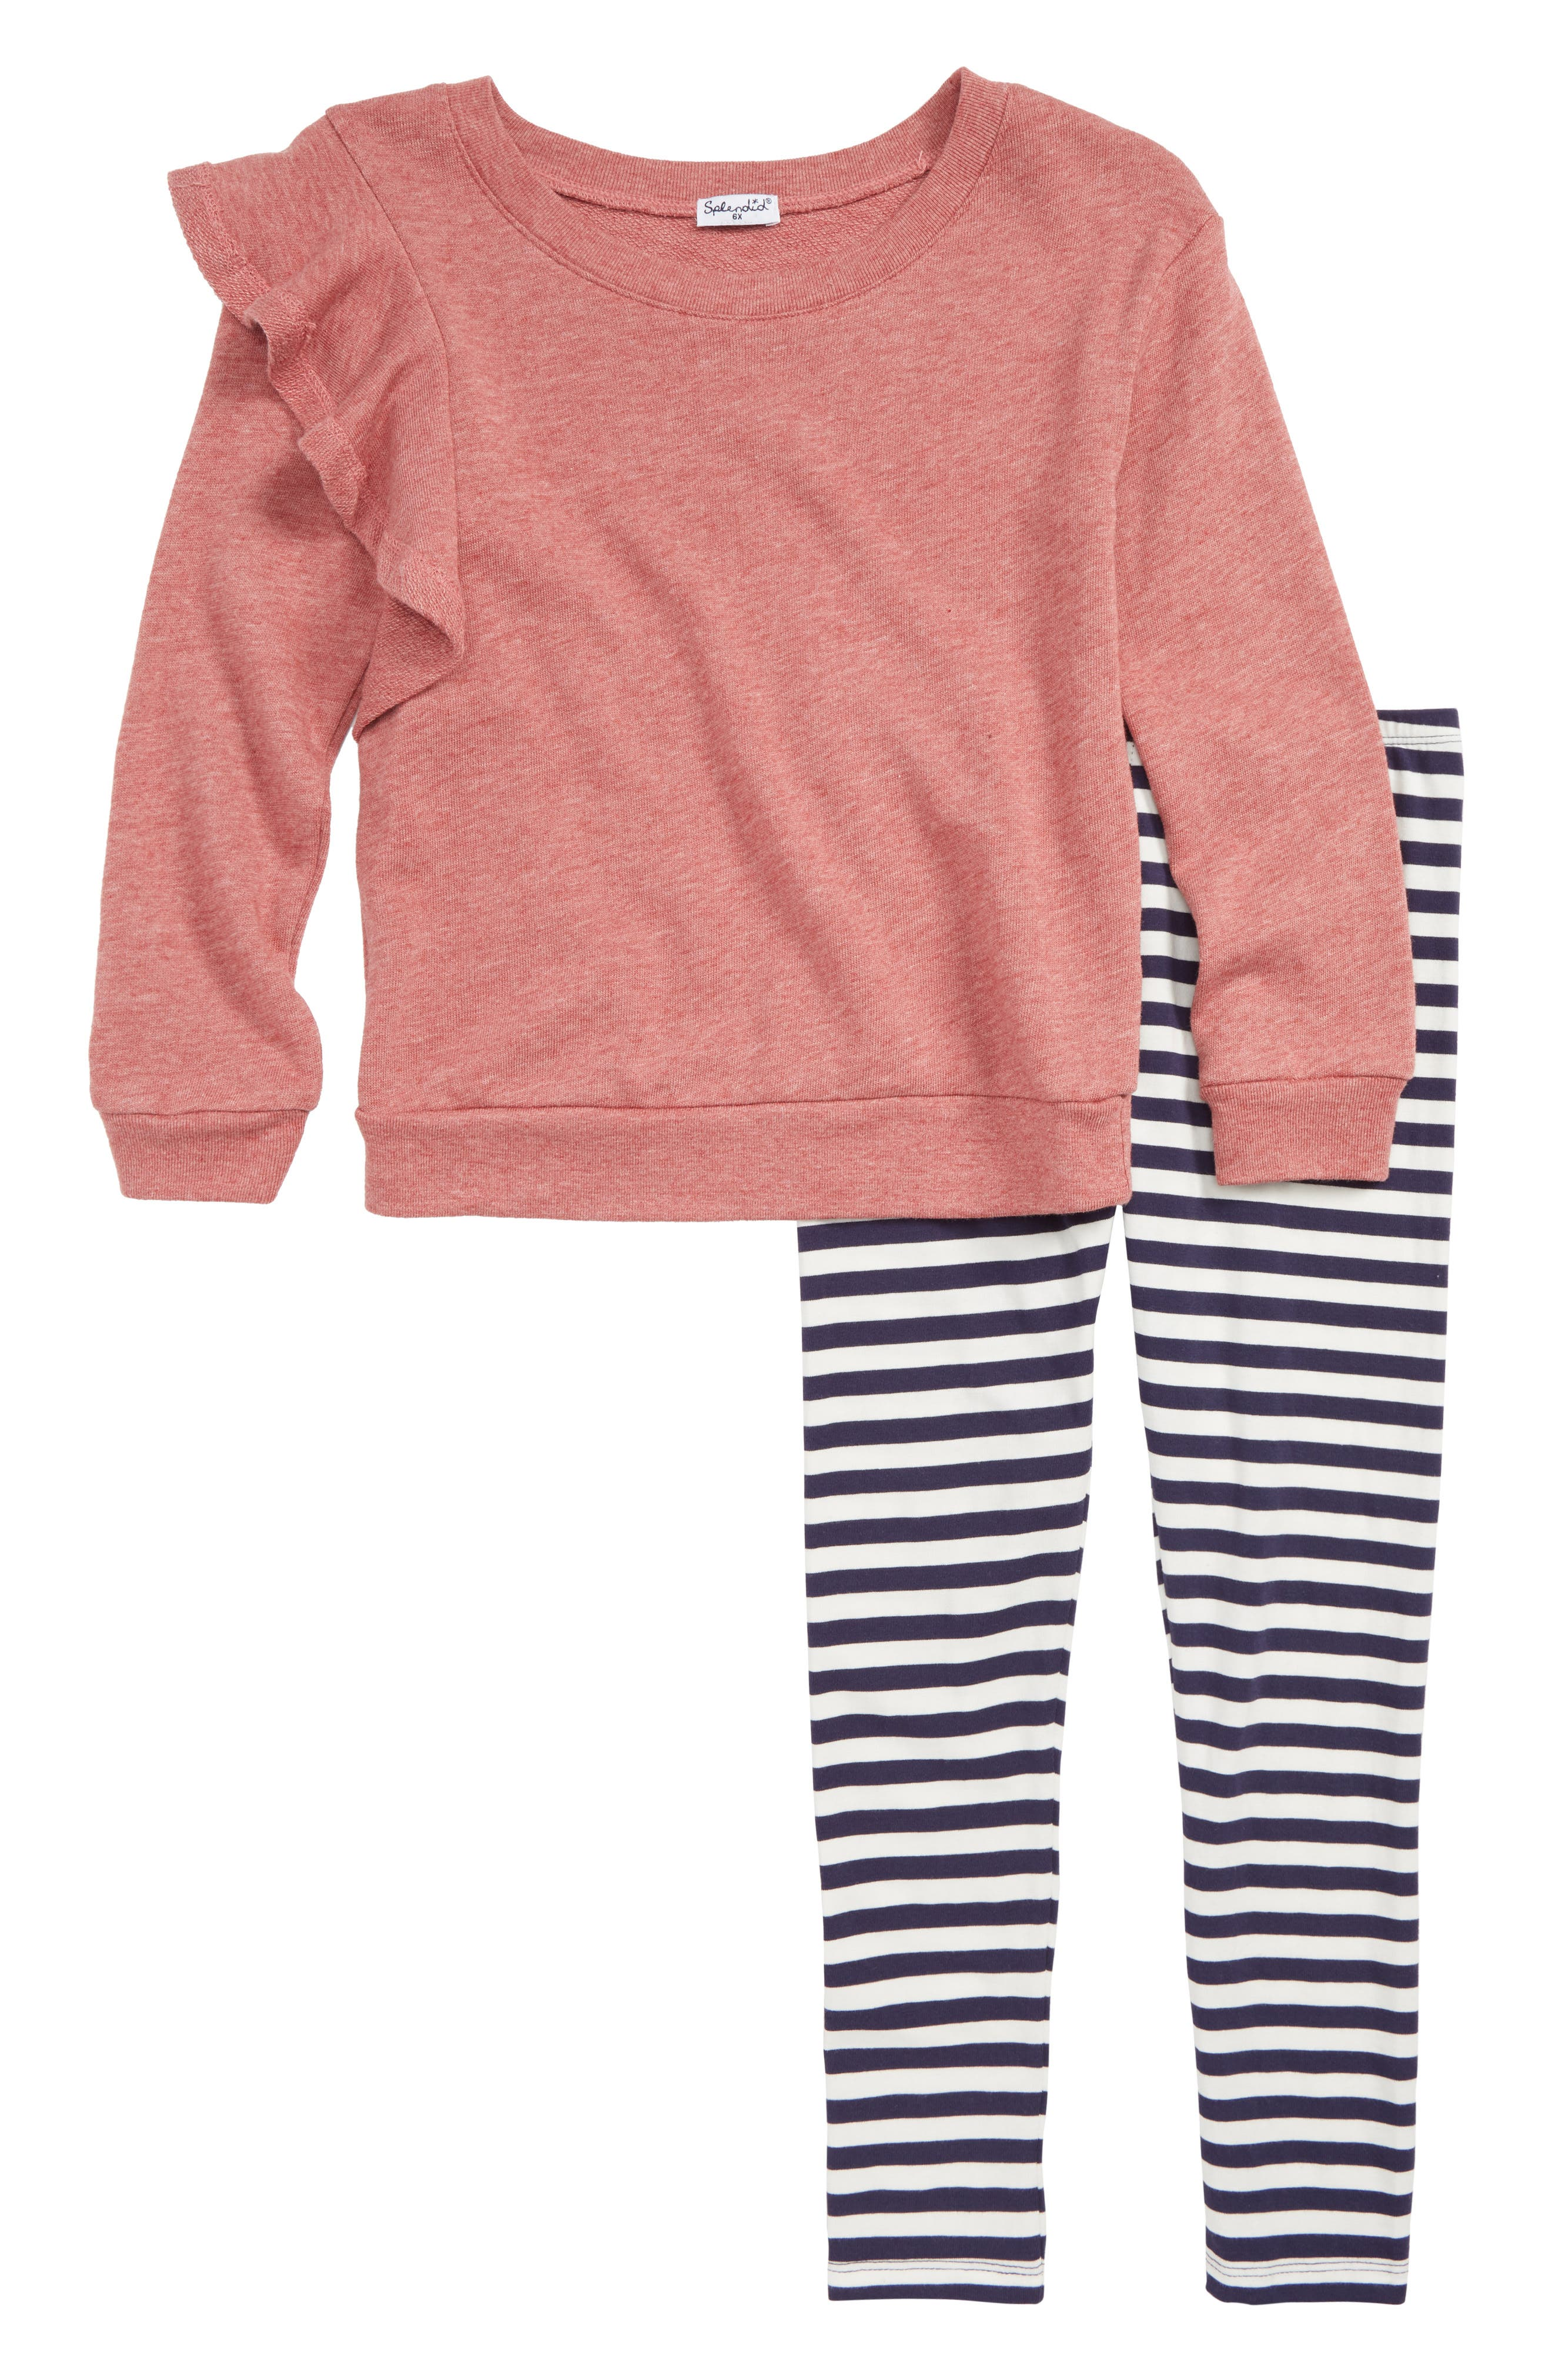 Ruffle Sweatshirt & Leggings Set,                             Main thumbnail 1, color,                             WINTER ROSE